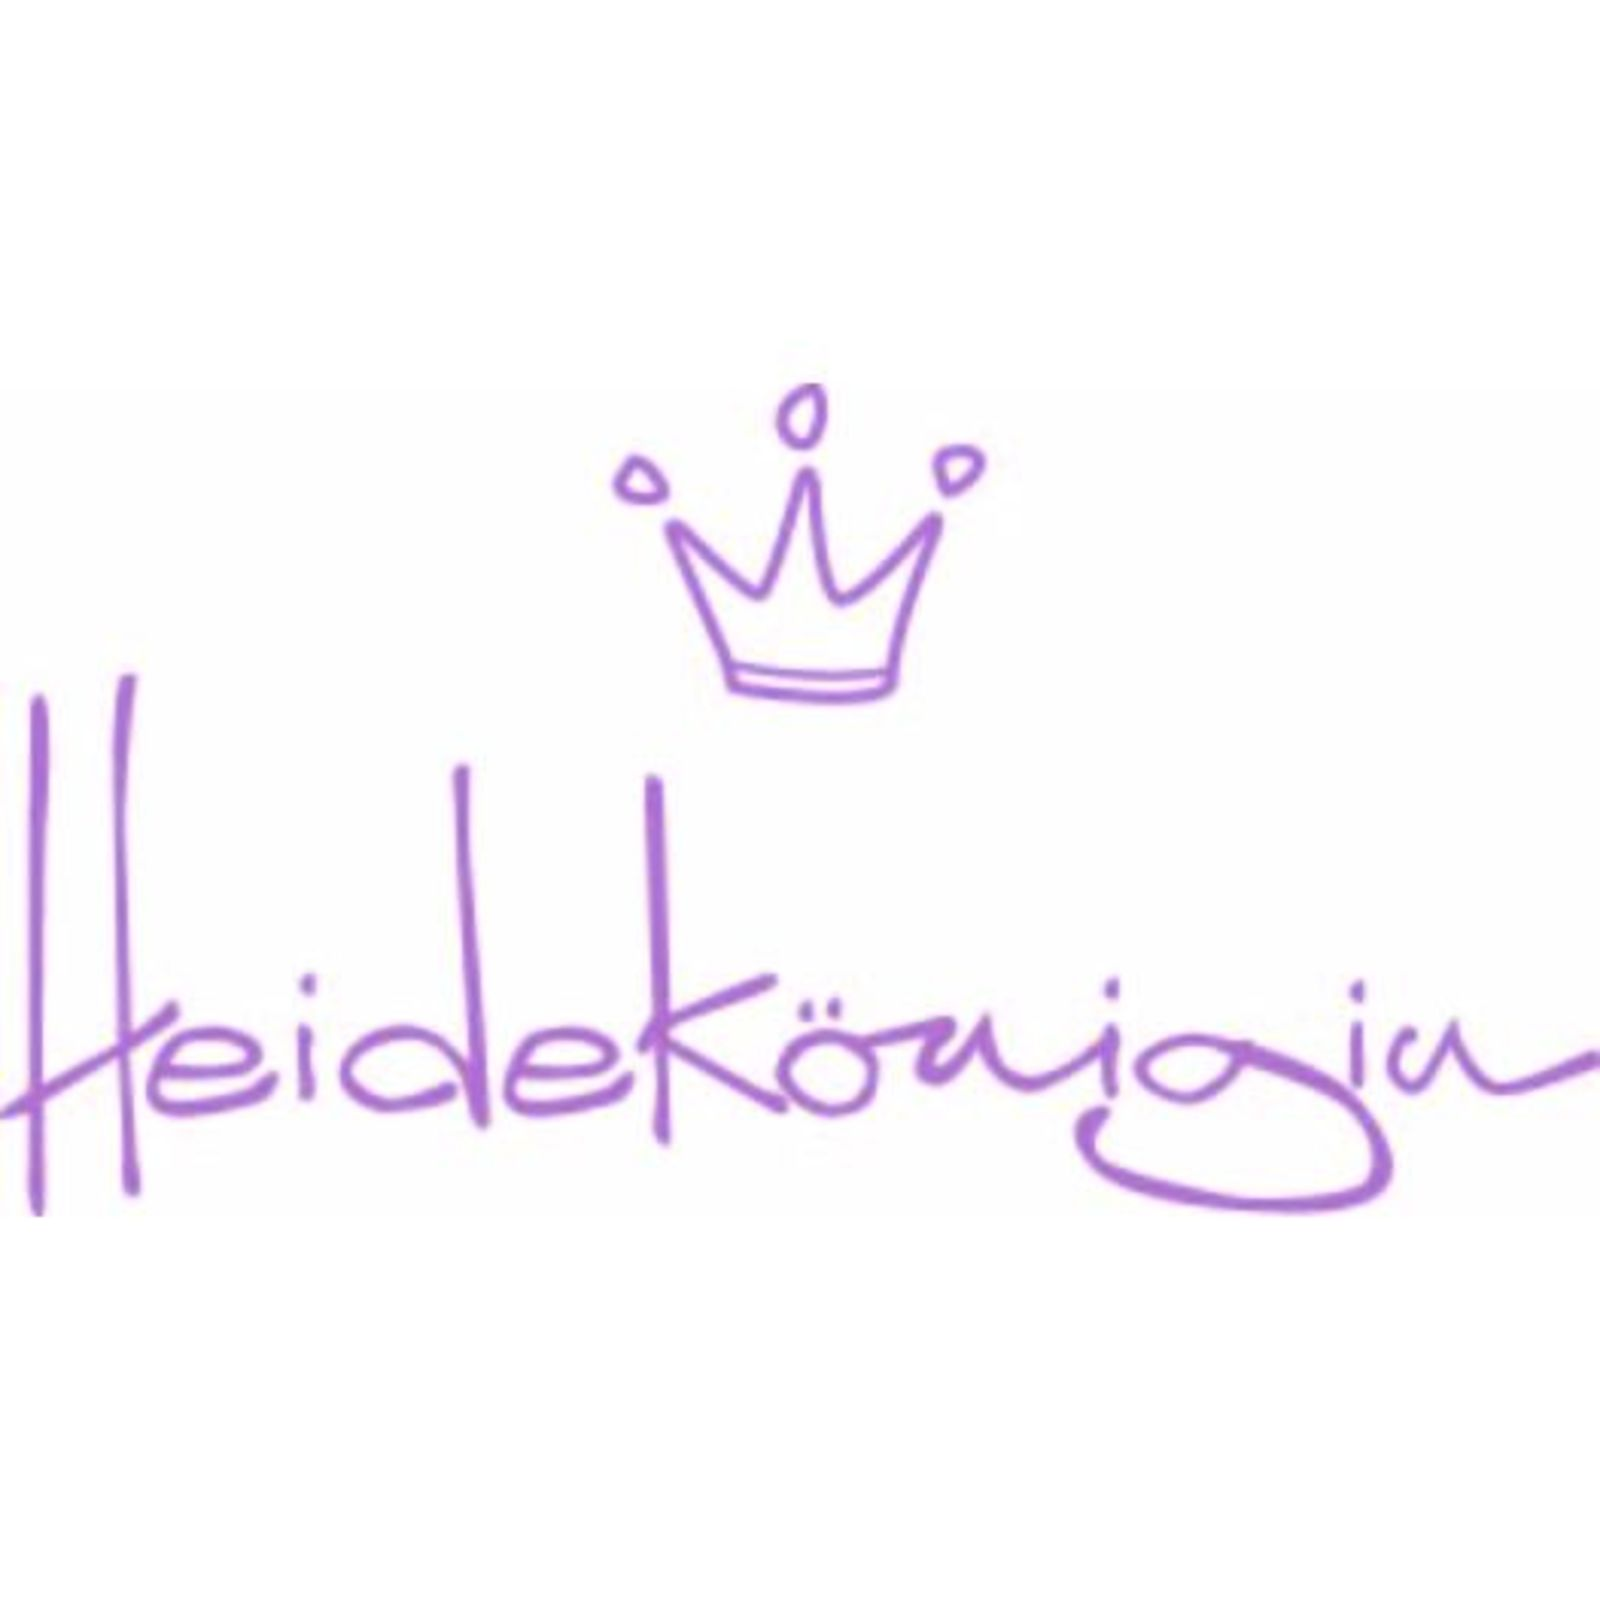 Heidekönigin